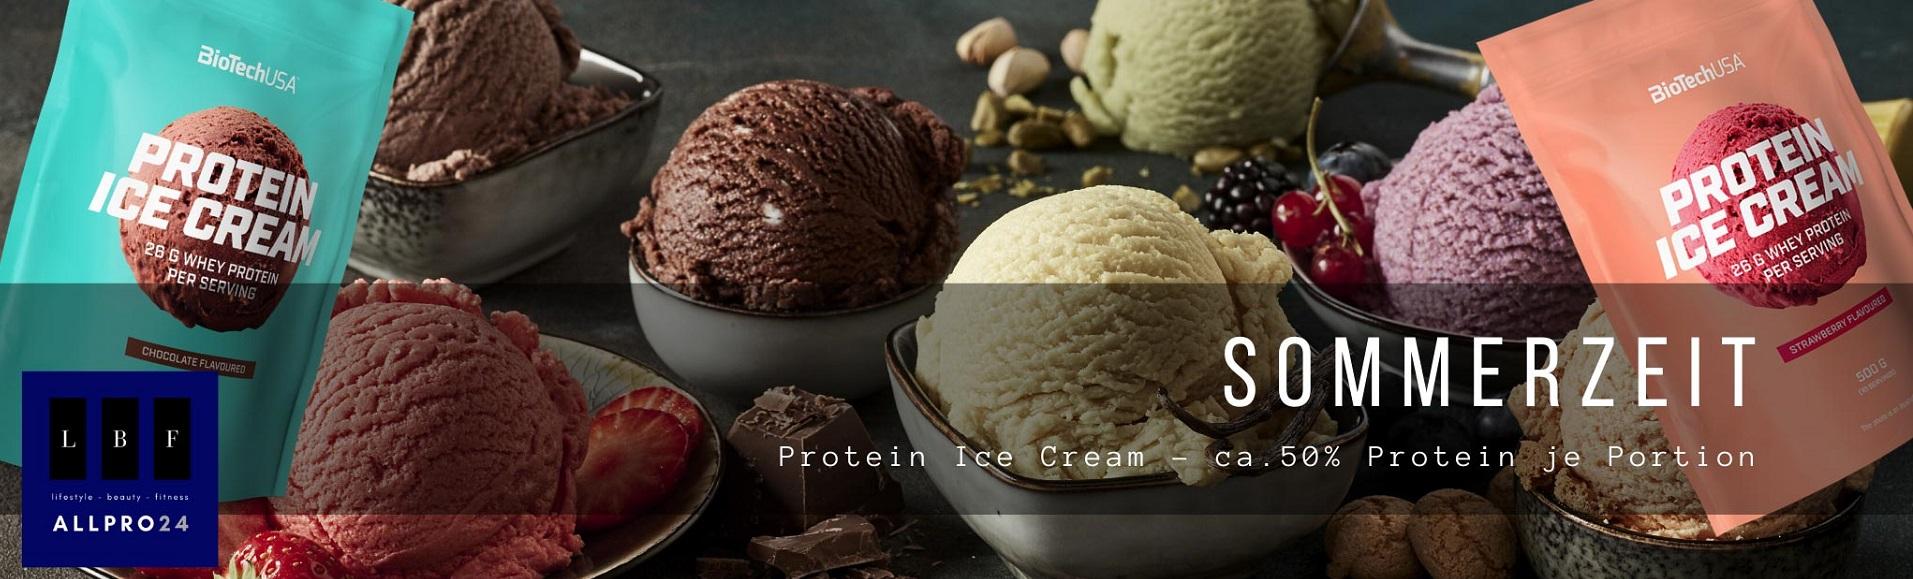 BiotechUSA Protein Ice Cream Erdbeere 500g